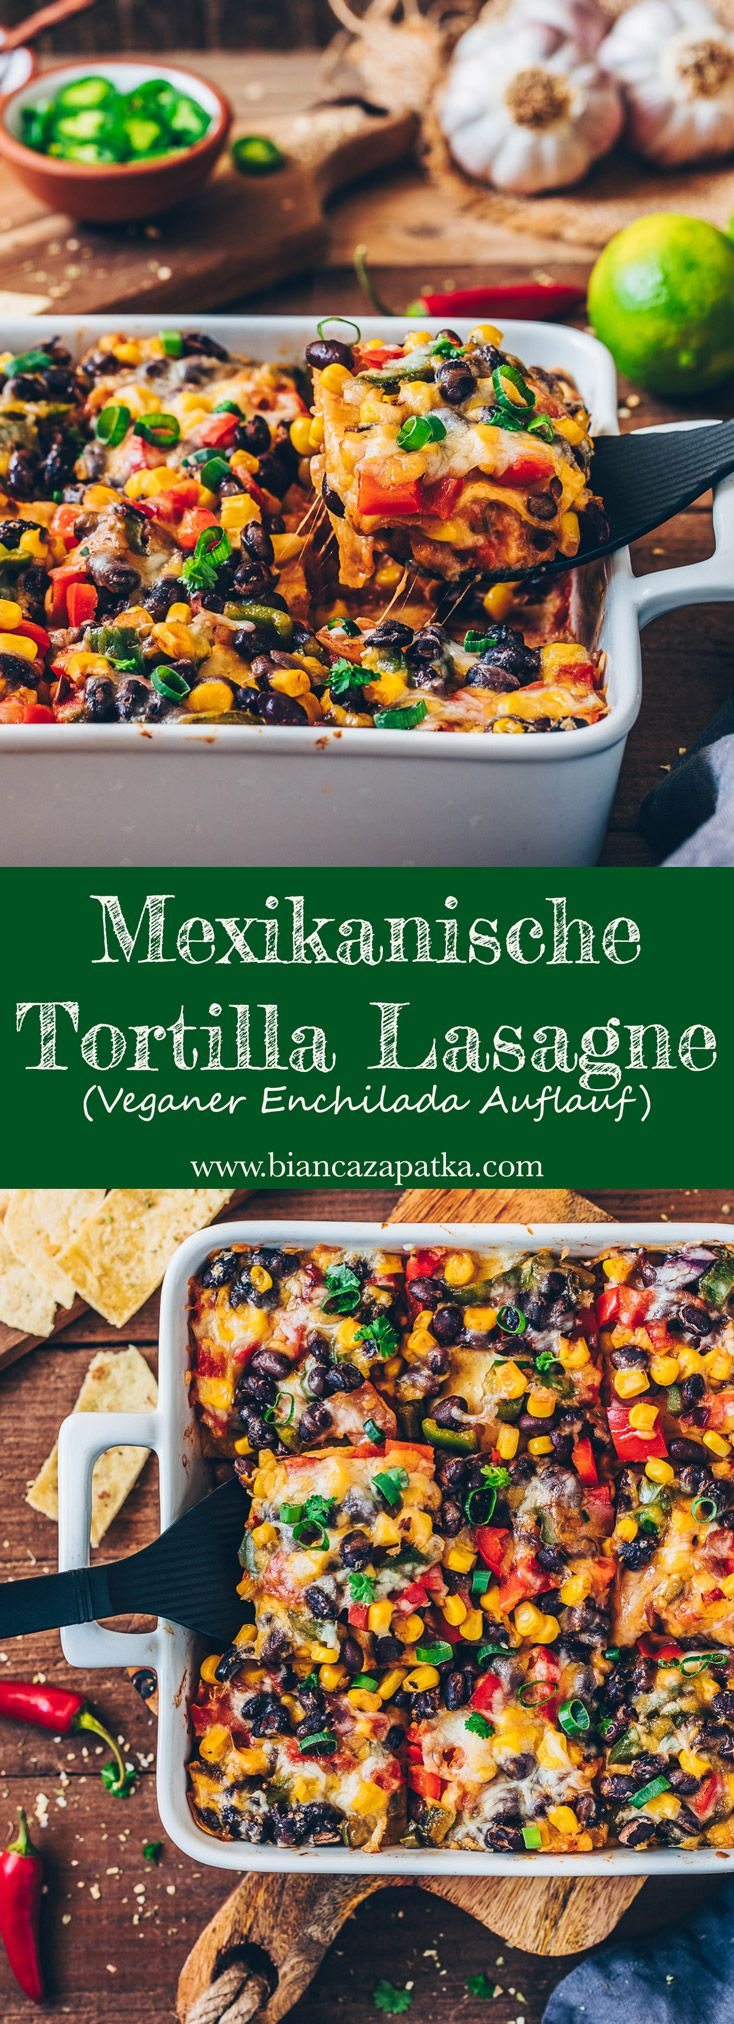 Mexikanische Tortilla Lasagne (vegan, einfach) #mexicanfoodrecipes